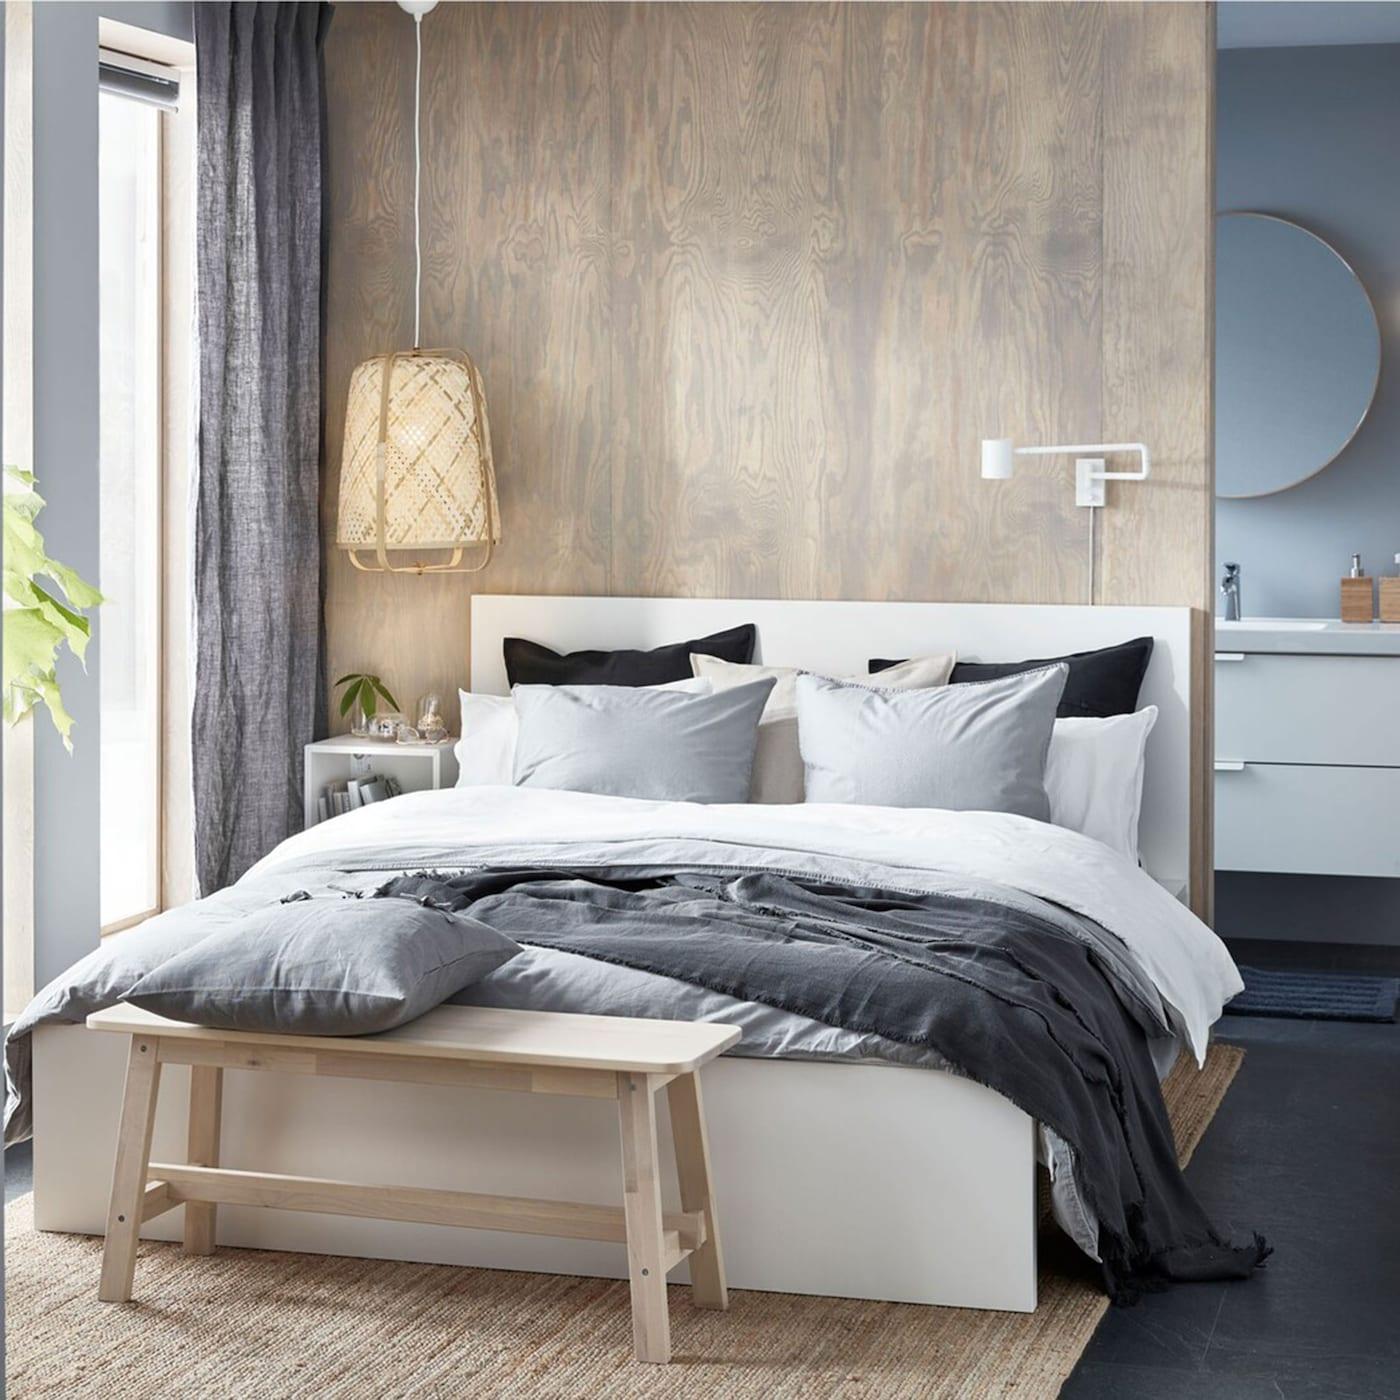 The Stylish Small Bedroom That Feels Like Luxury Ikea Switzerland